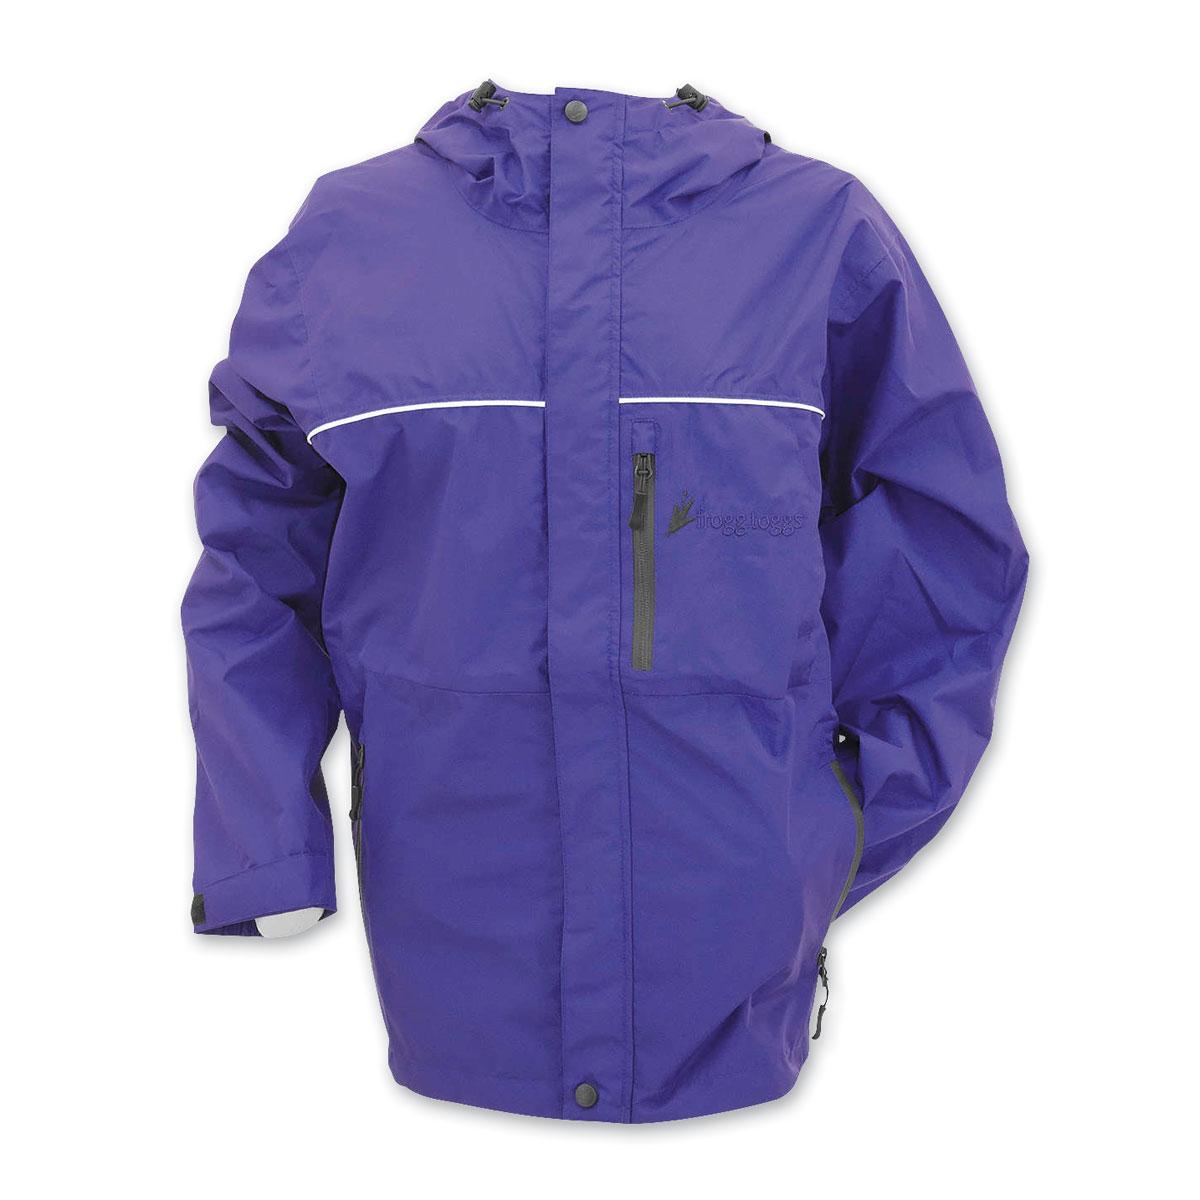 Frogg Toggs Women's Java Toadz Purple Rain Jacket